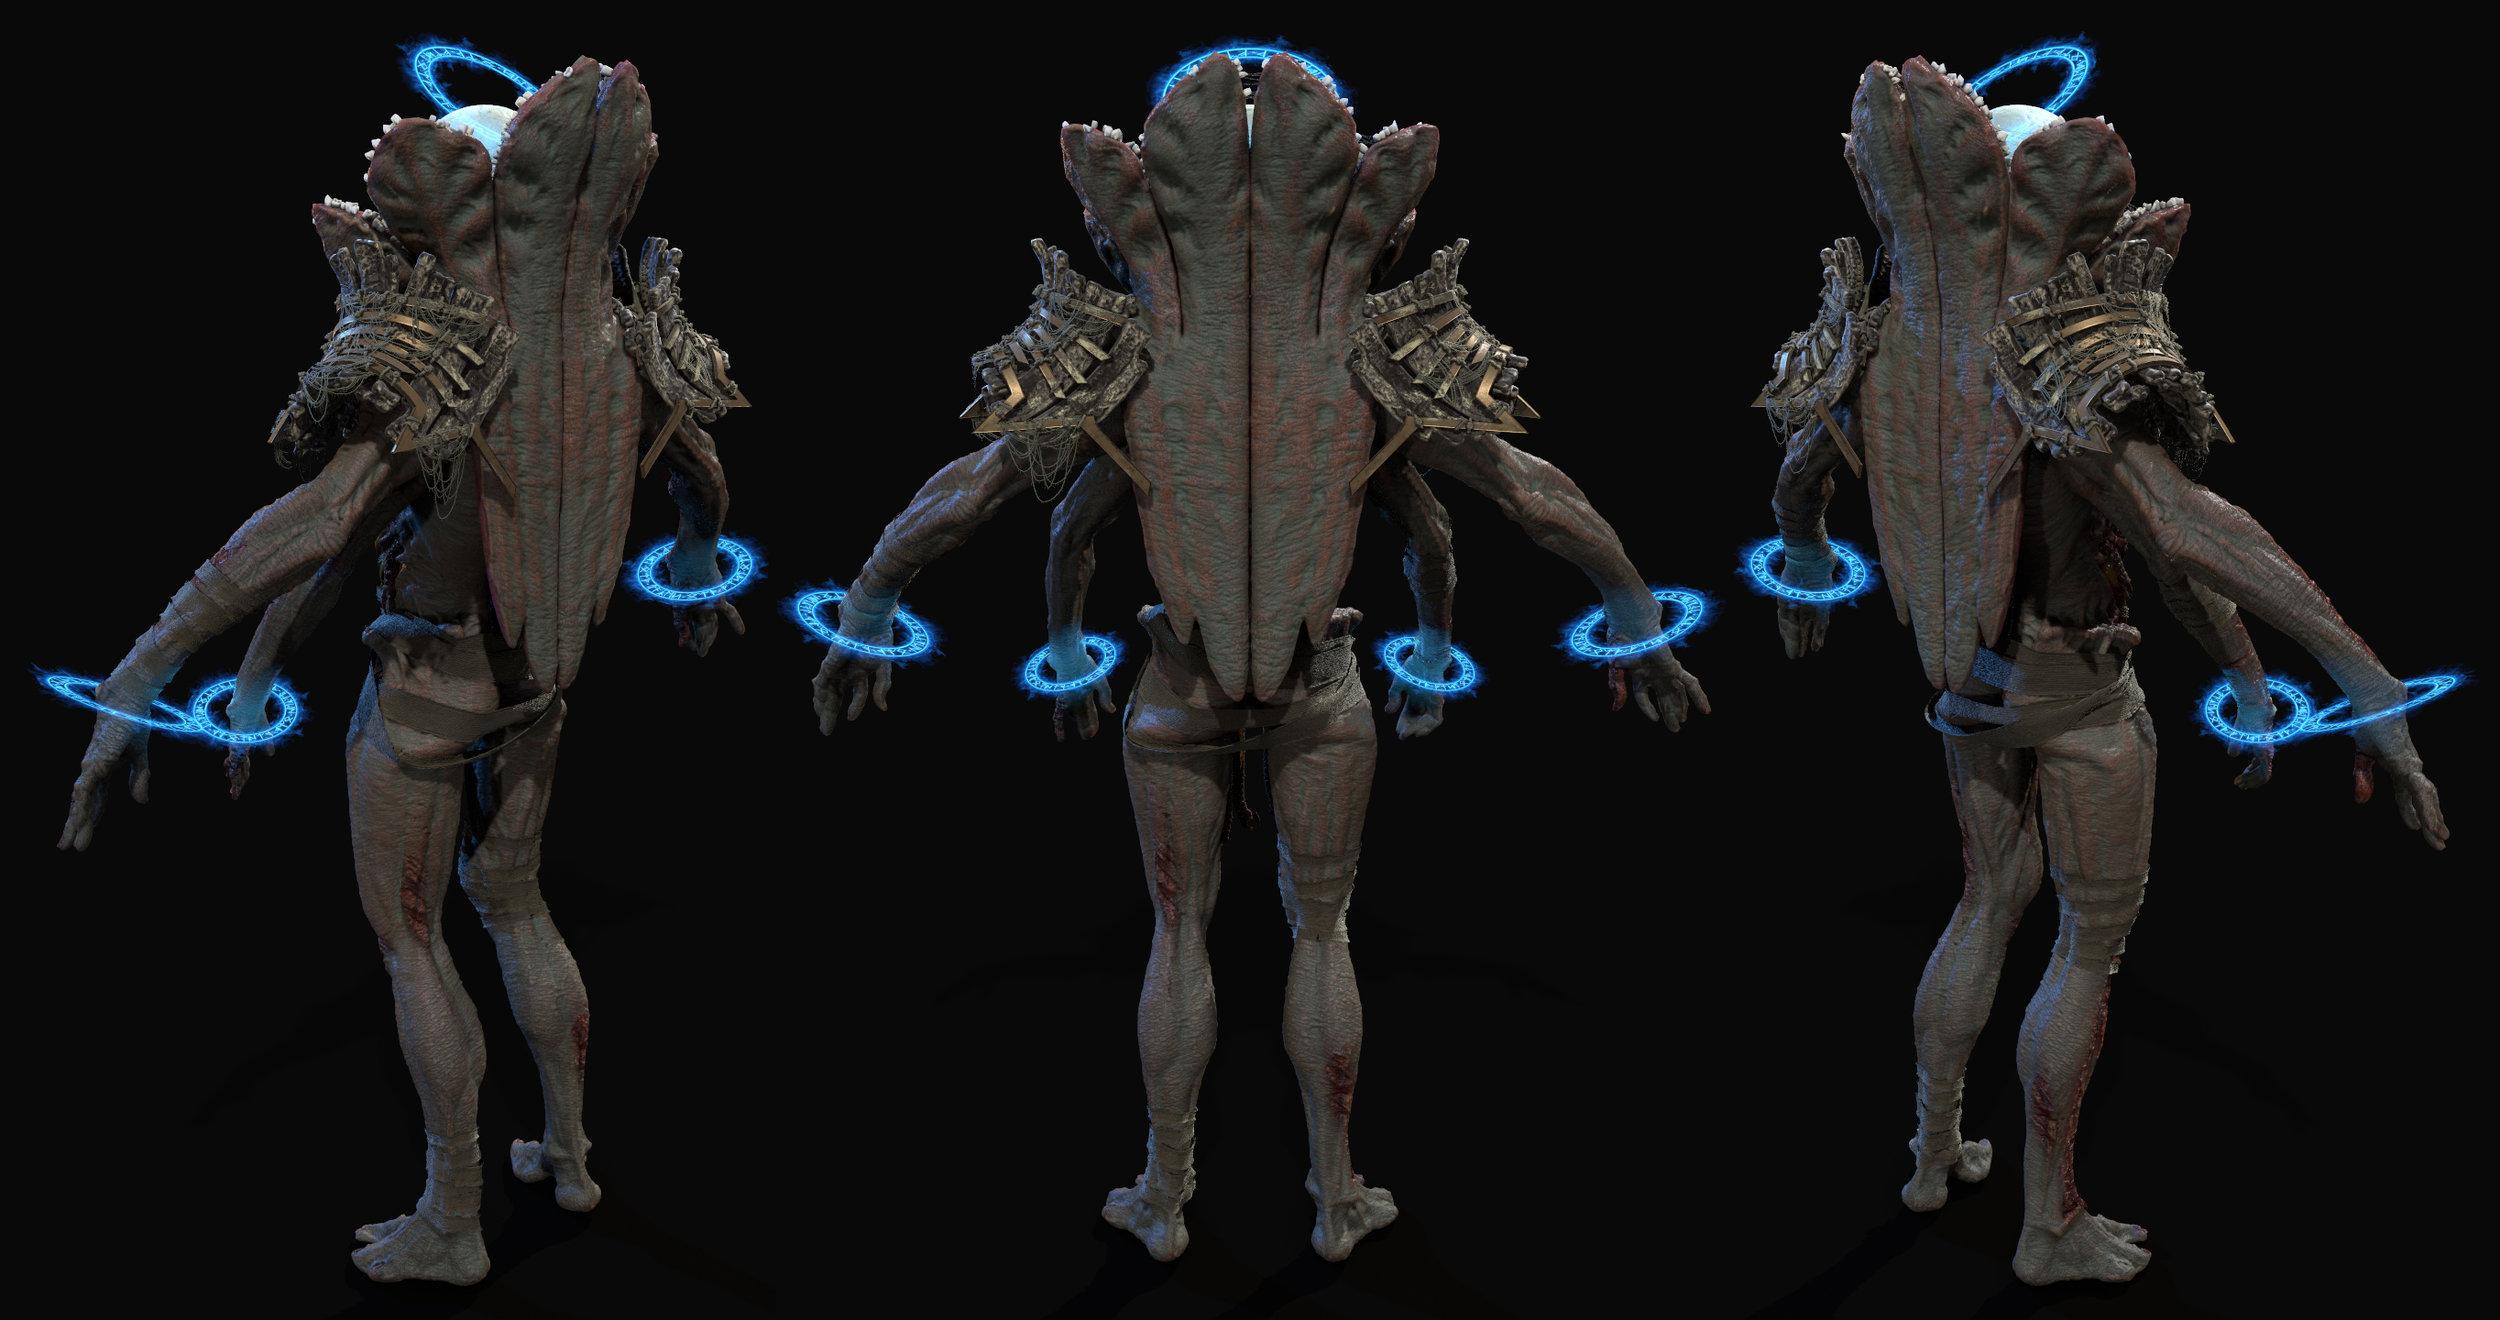 skull_head_body_turnaround_02_large.jpg